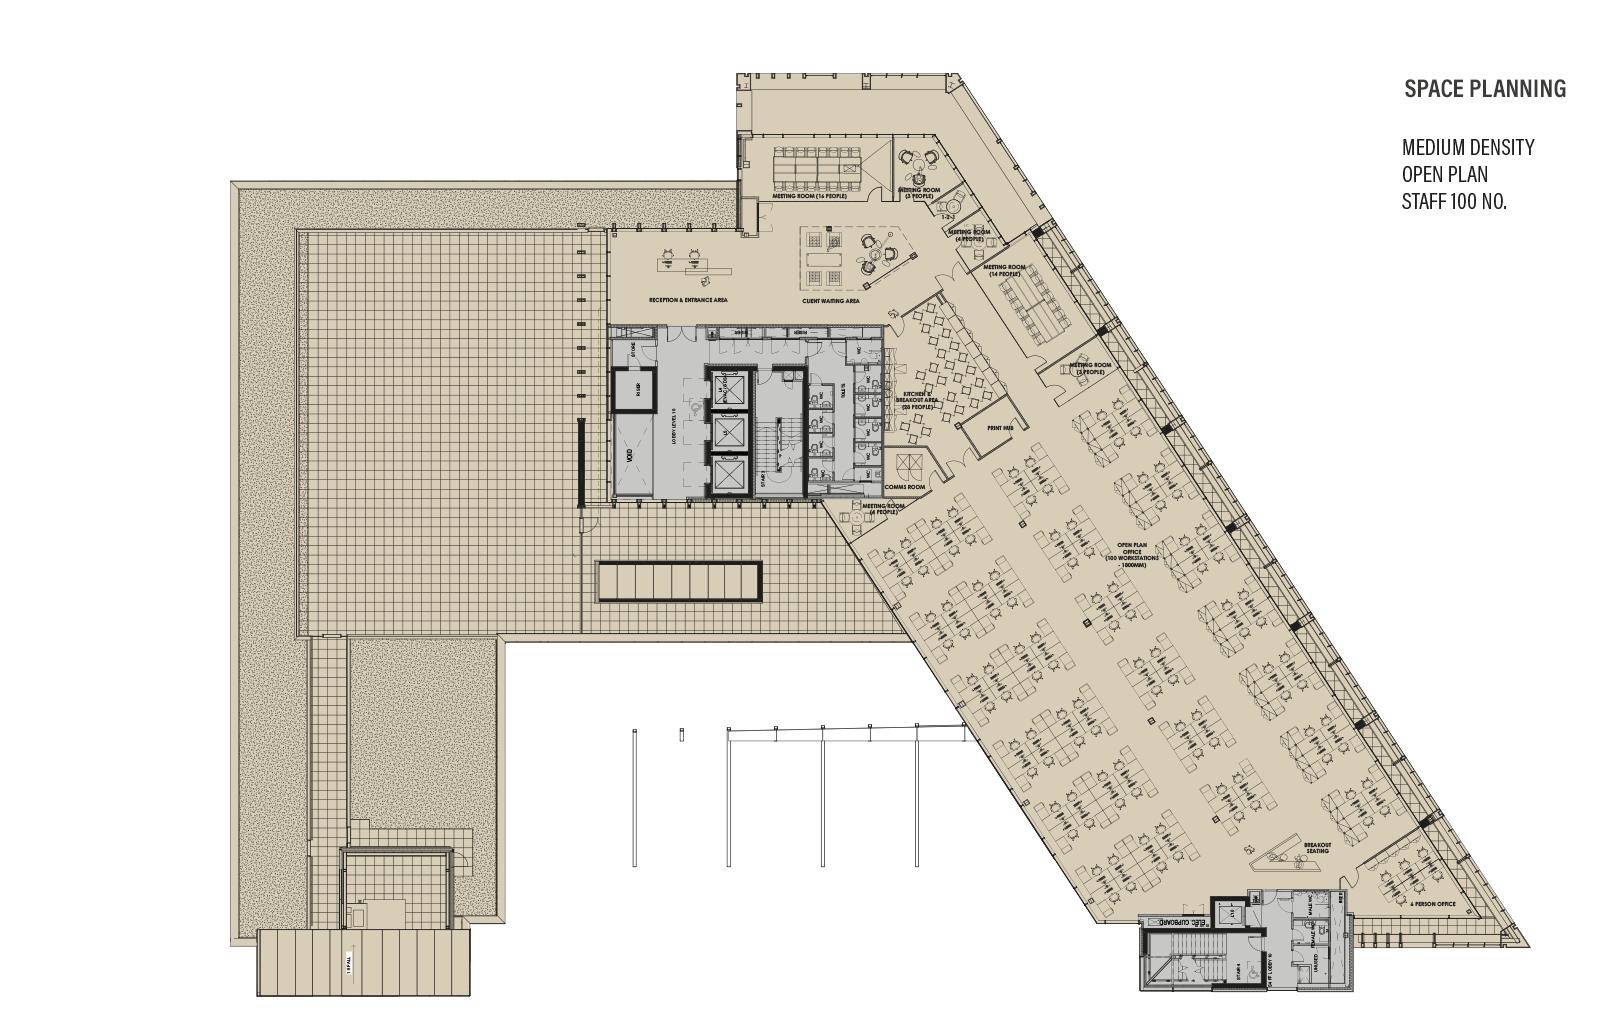 Ninth Floor Plan - Space Planning Medium